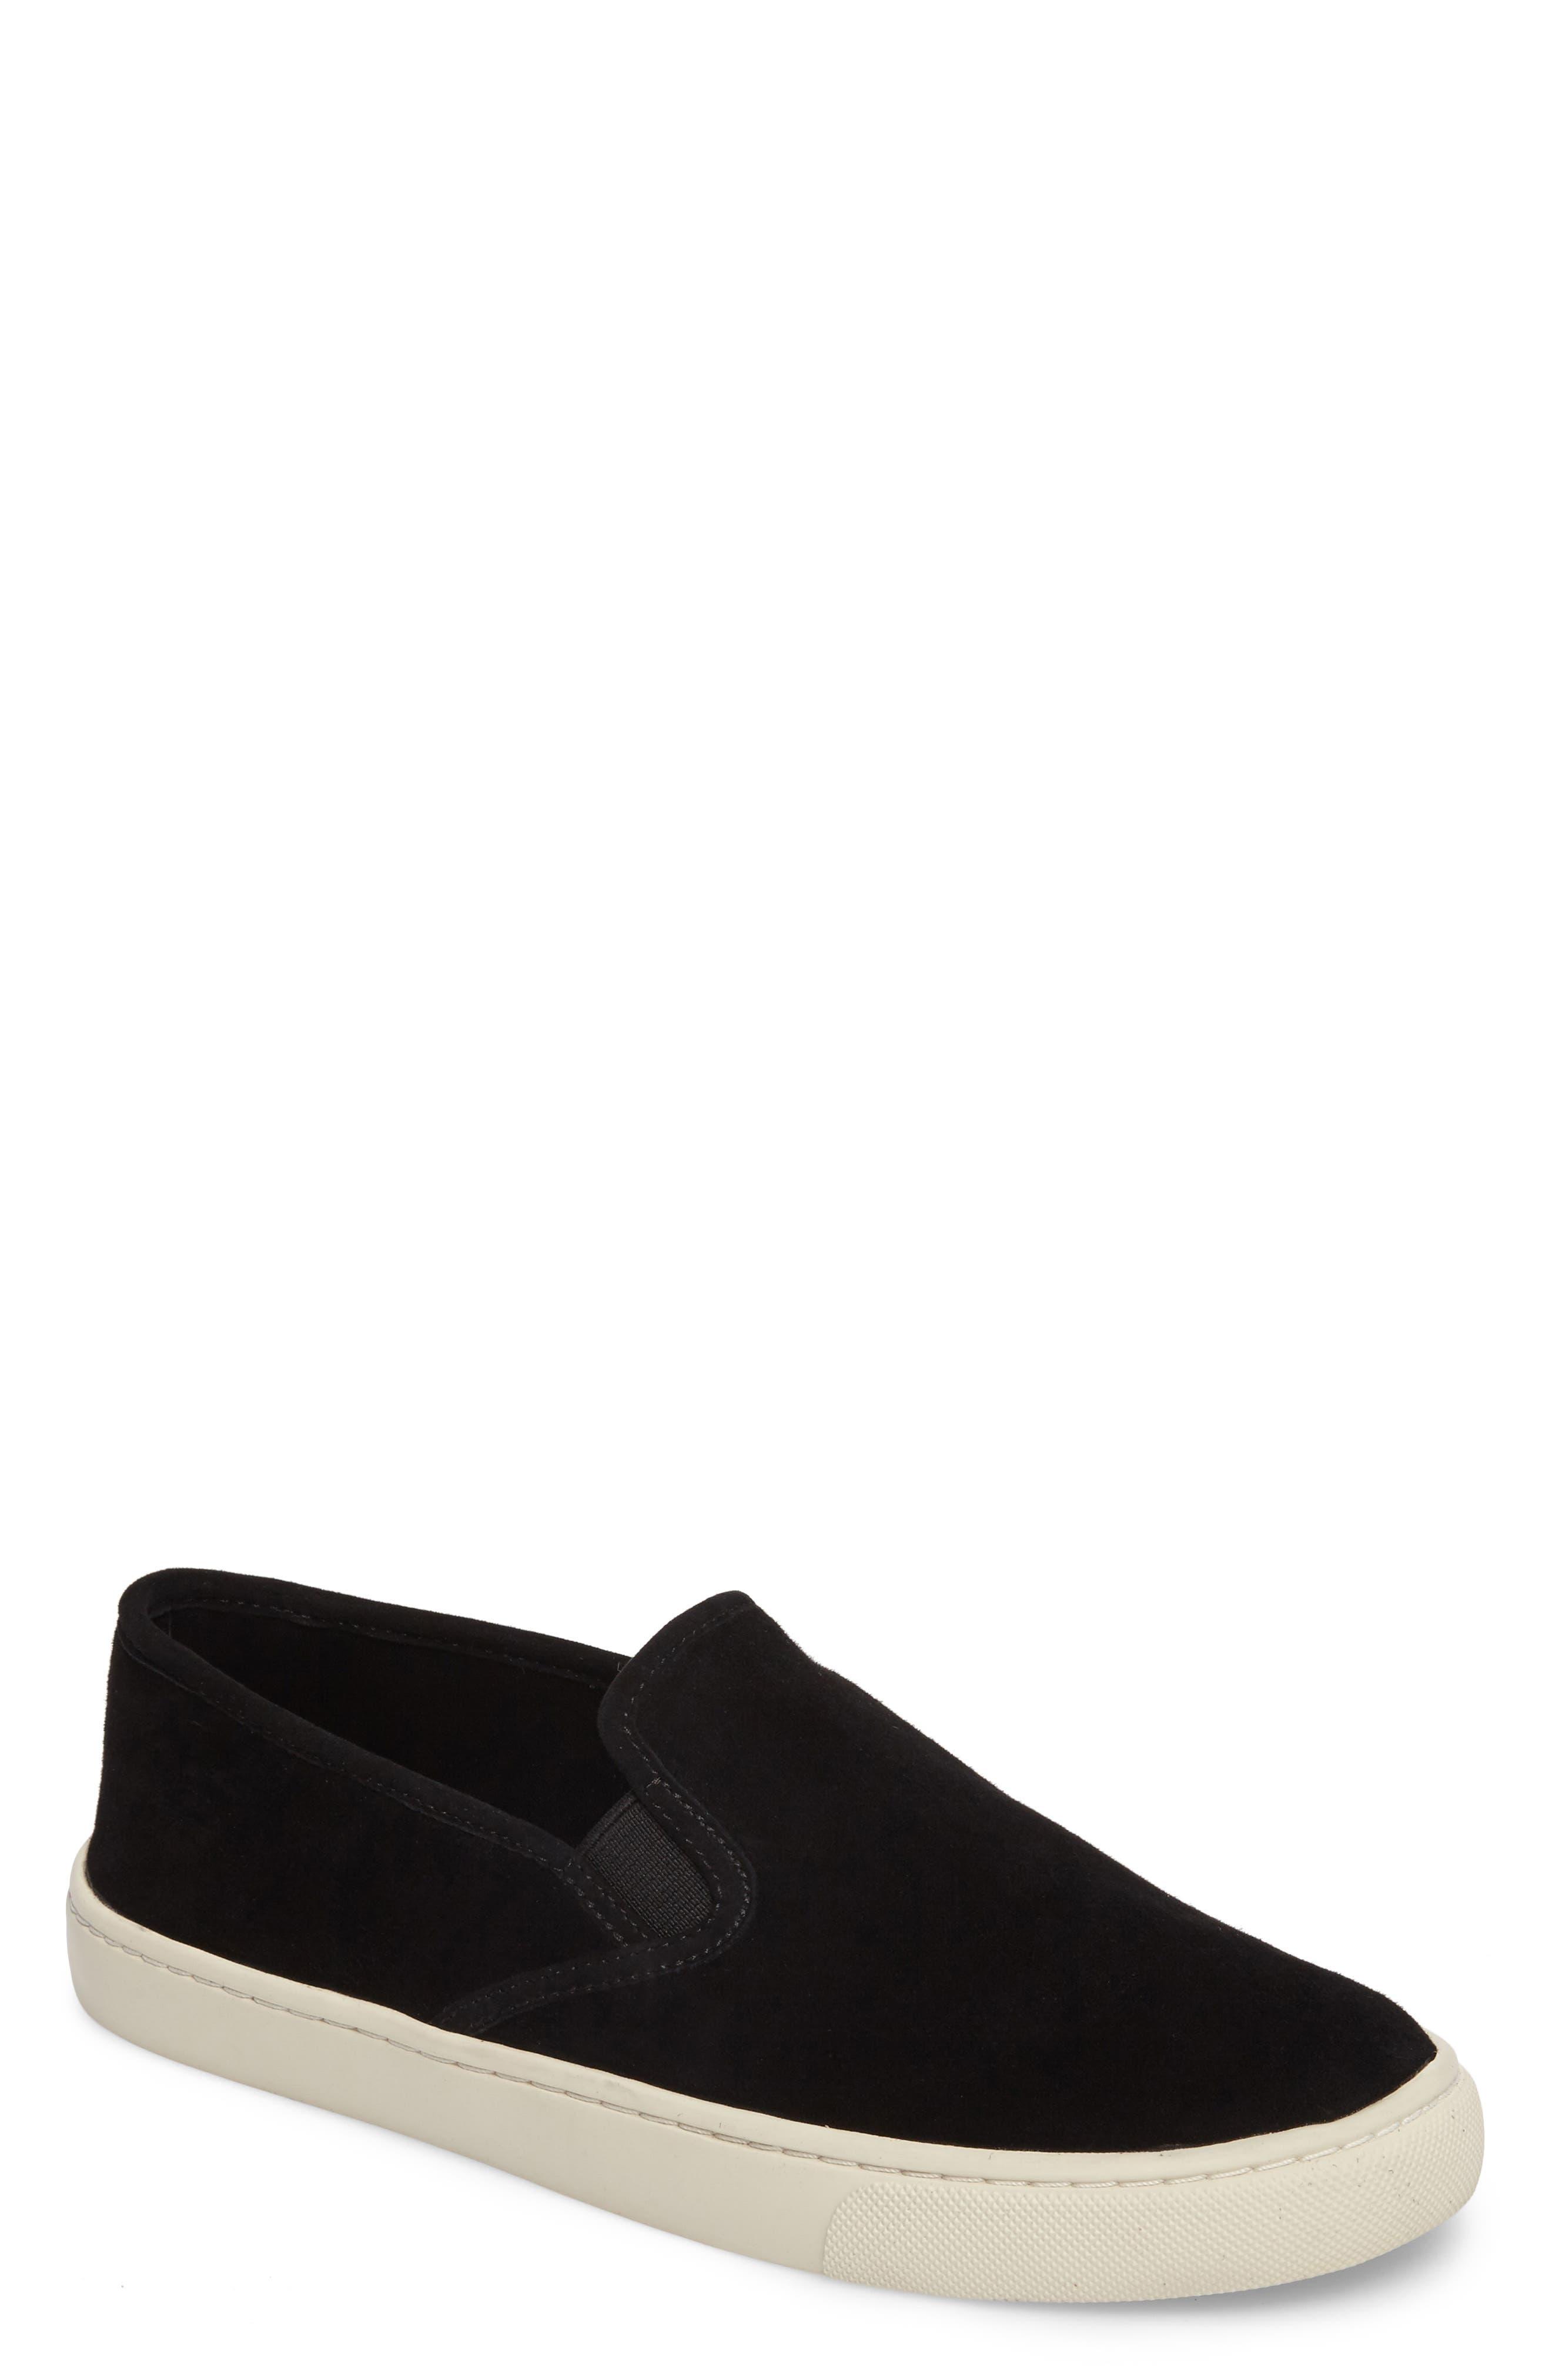 Max Slip-On Sneaker,                             Main thumbnail 1, color,